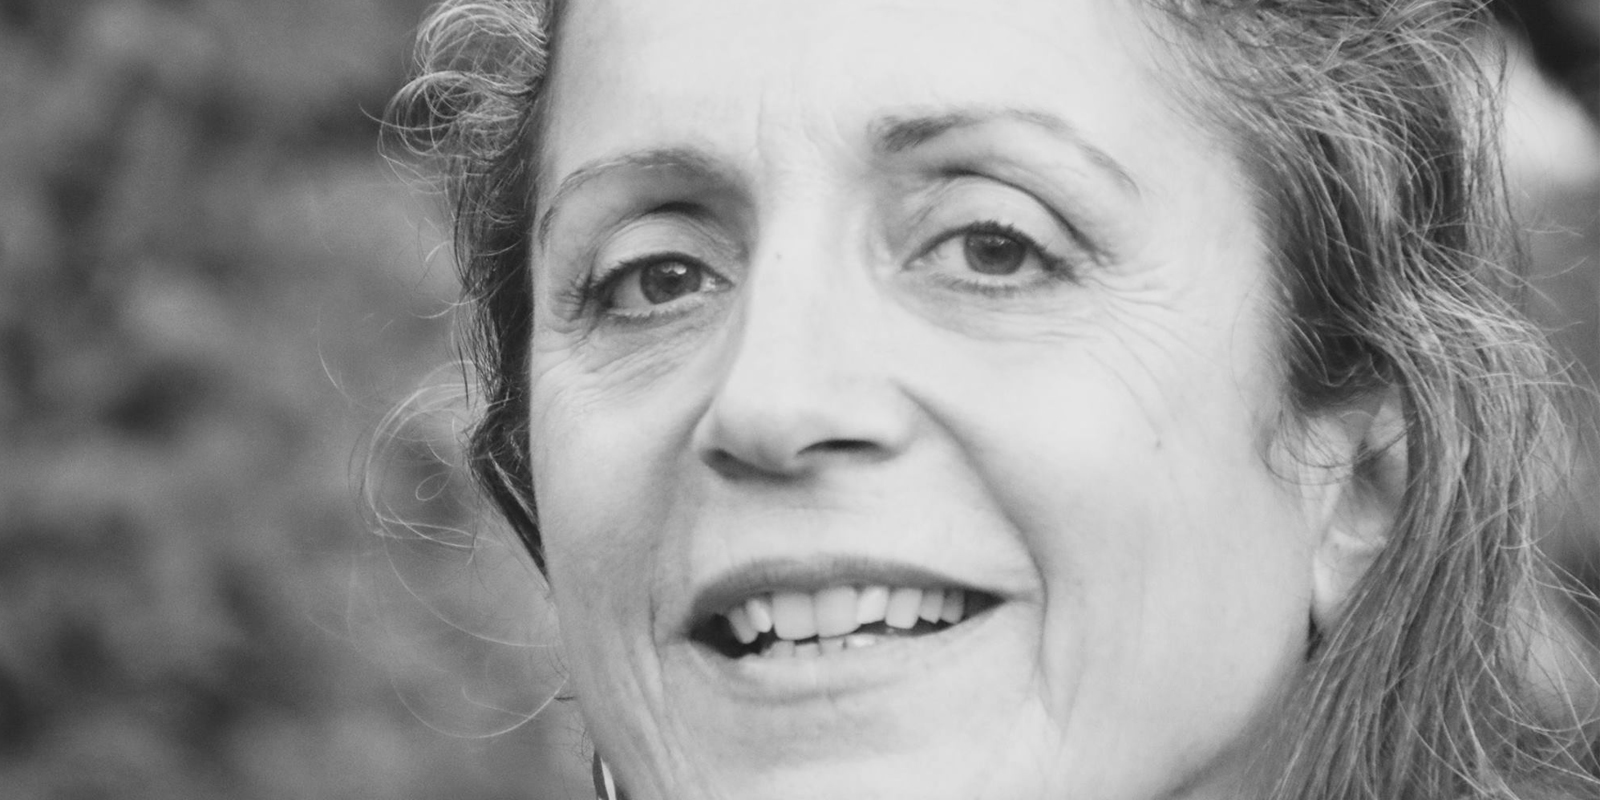 Angela Lattanzio